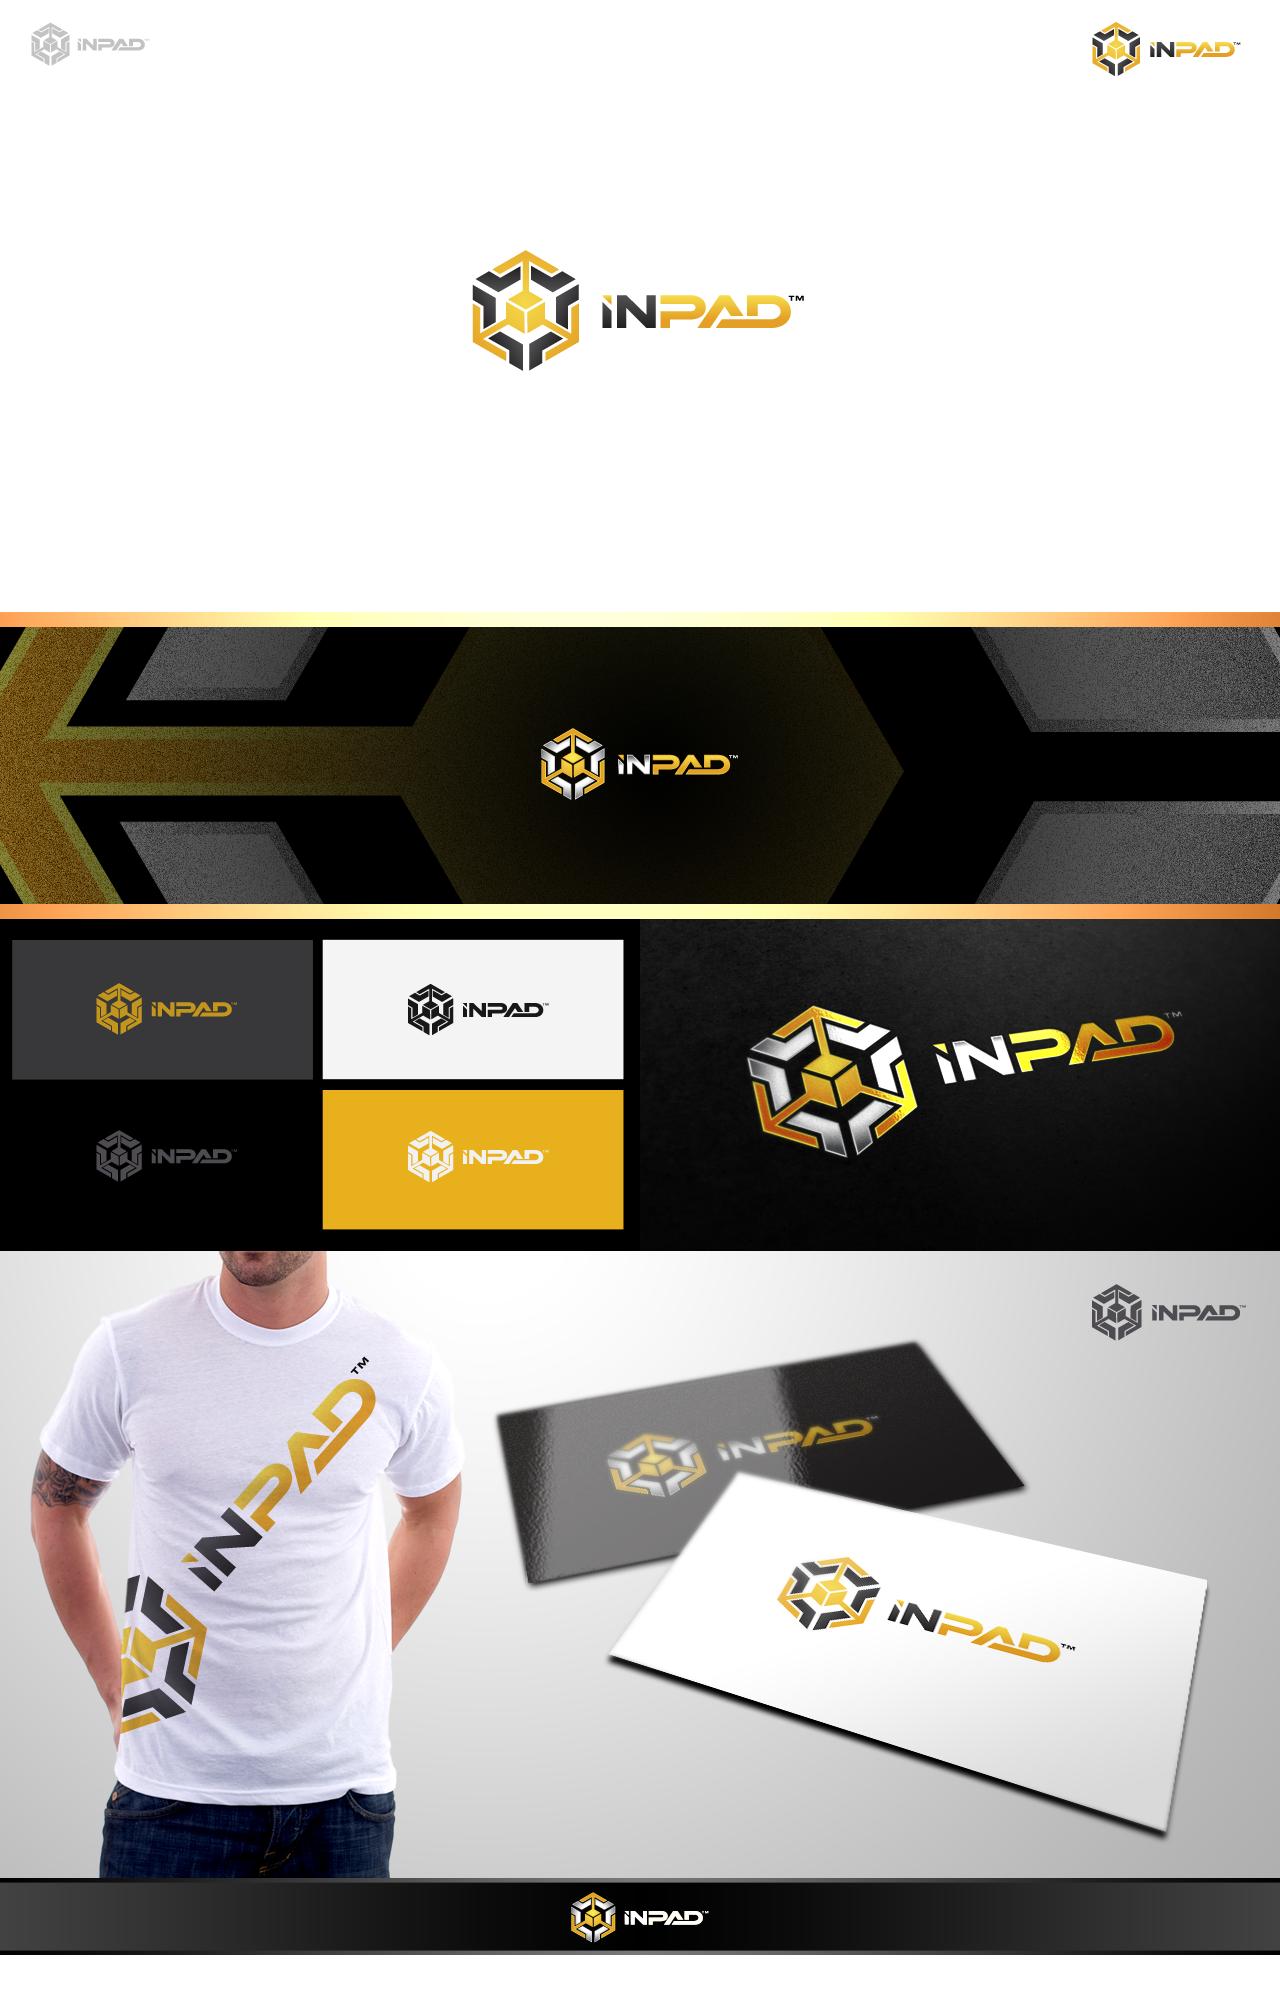 INPAD needs a new logo